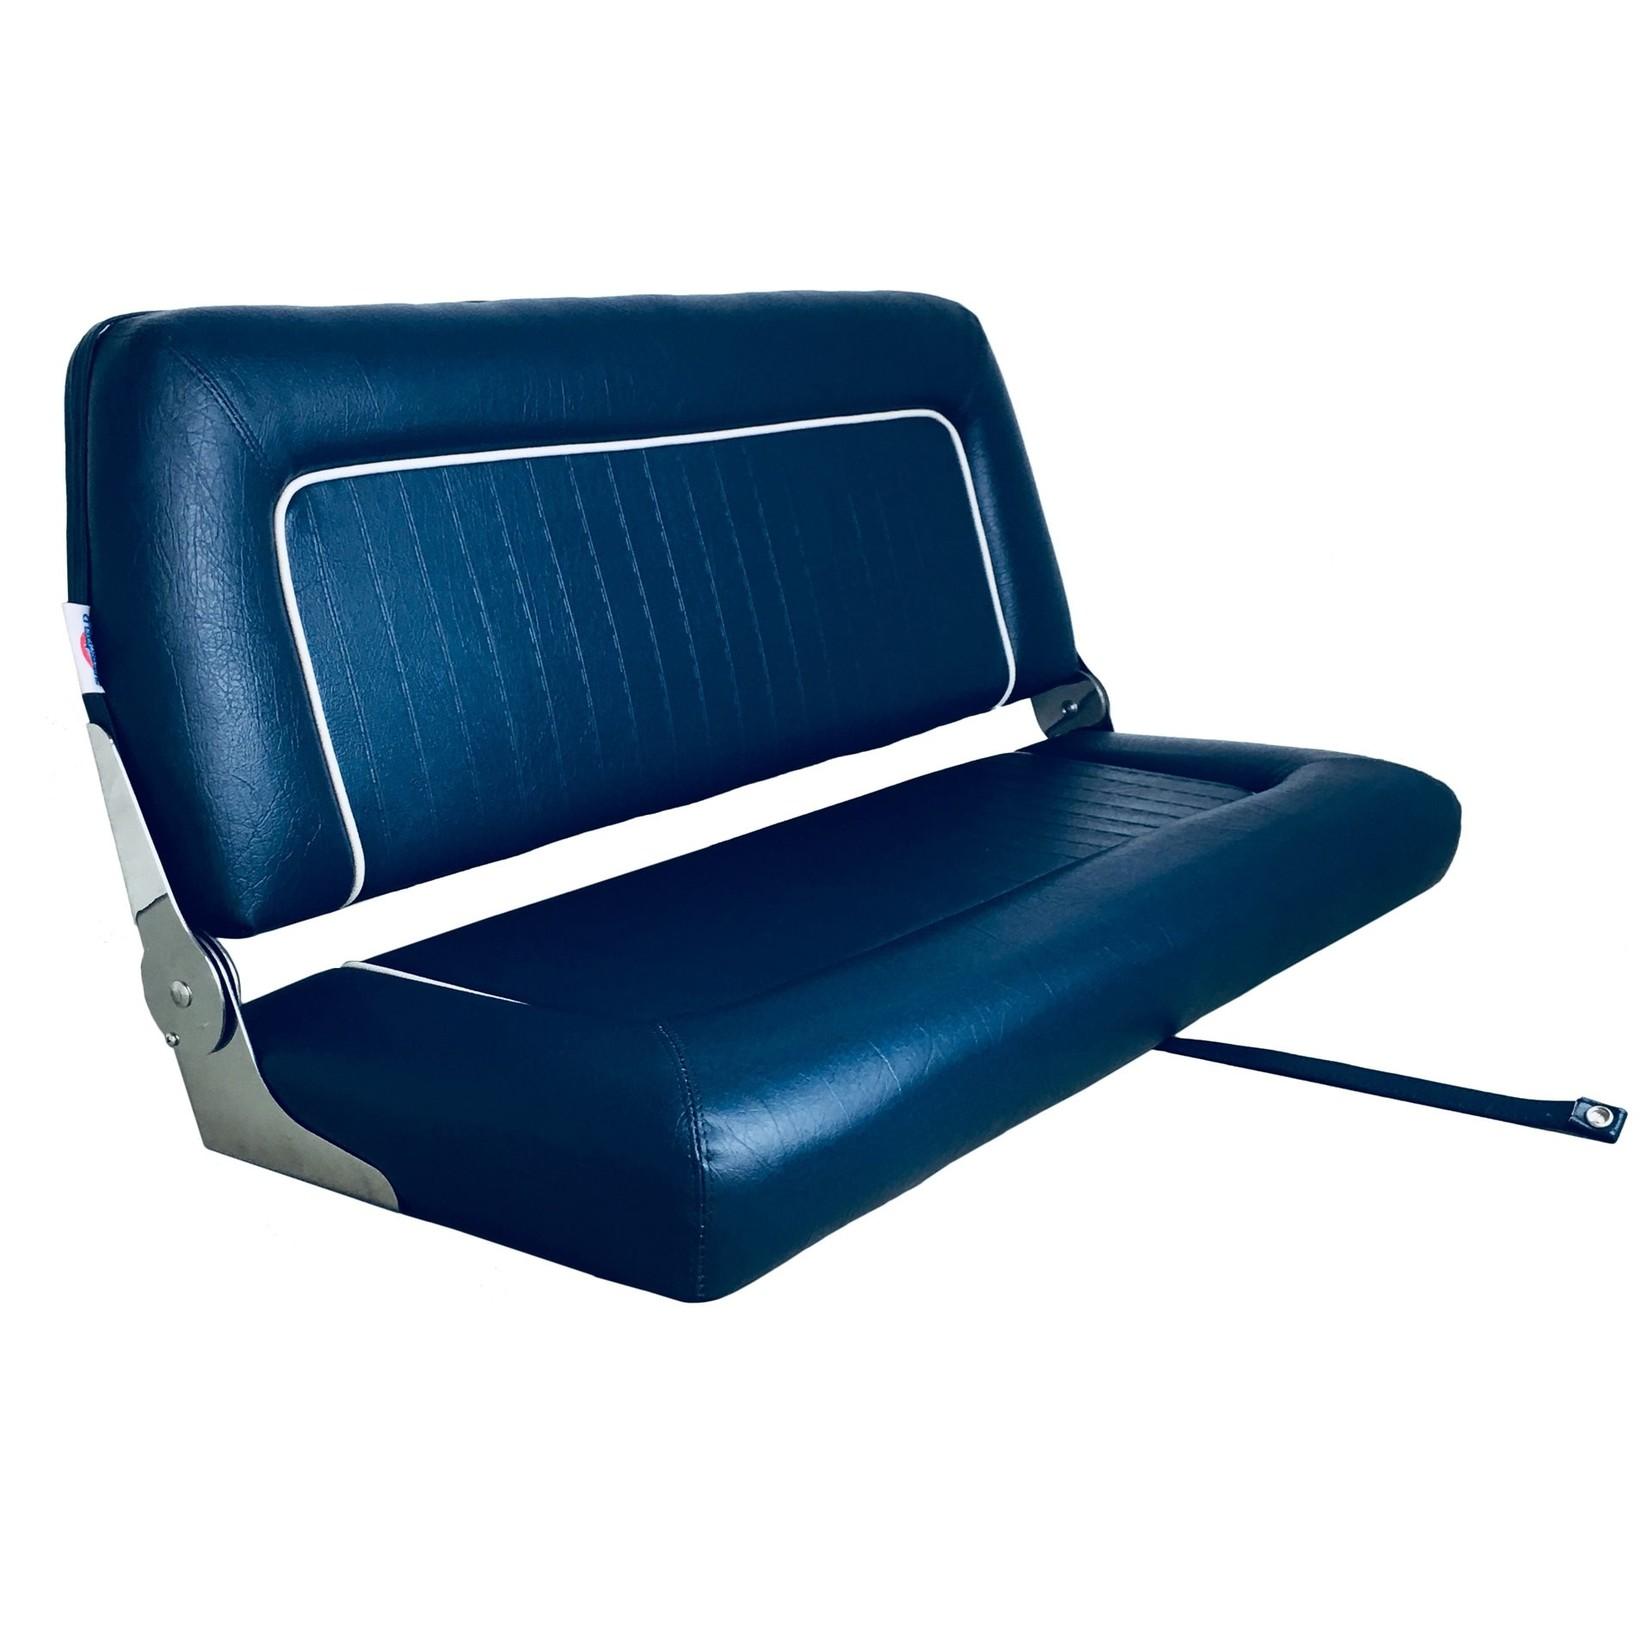 Allpa Coach De luxe Twin - Folding Boat Bench